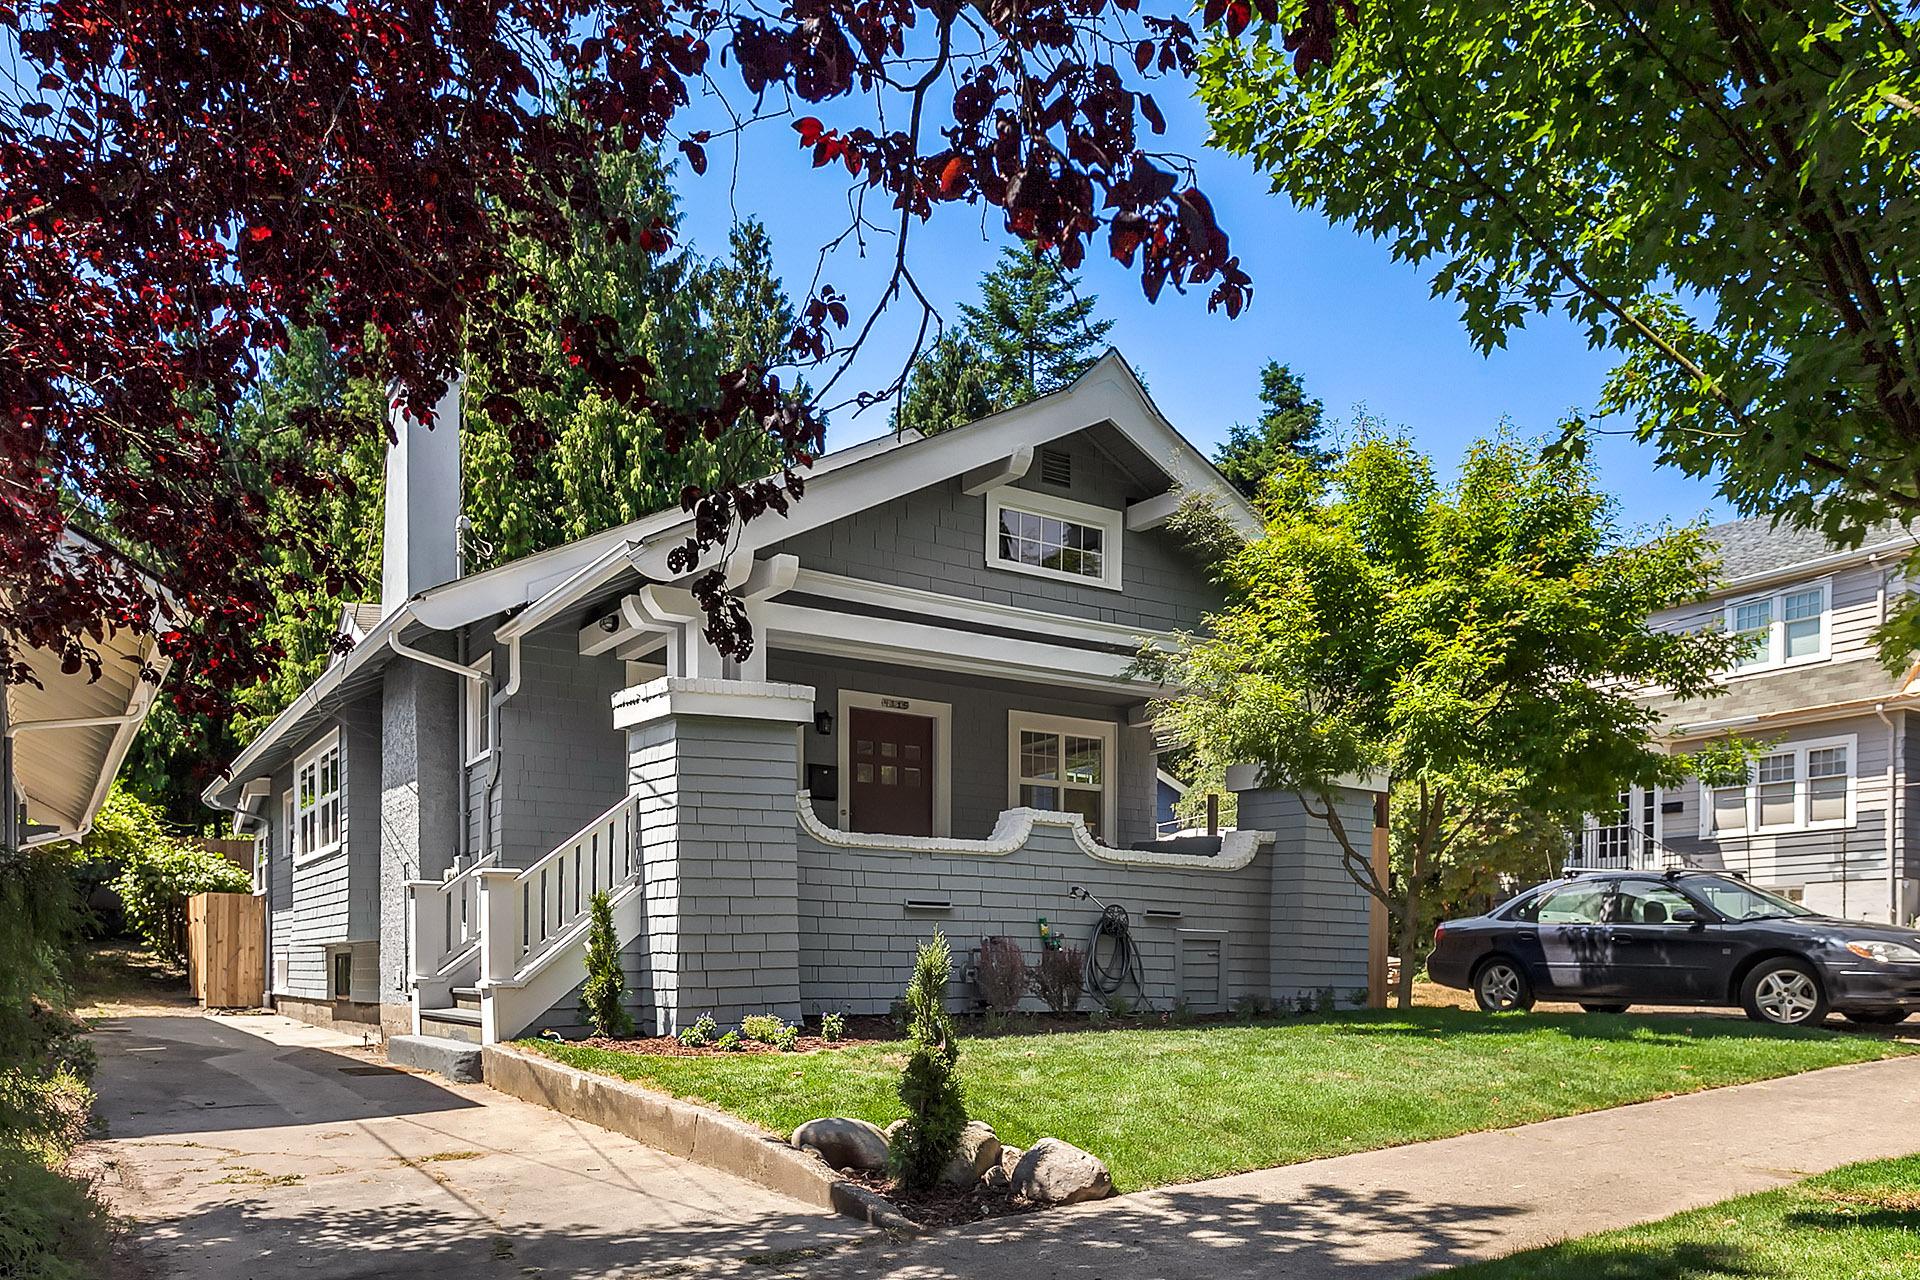 4115 Bagley Ave N, Seattle, WA - USA (photo 1)